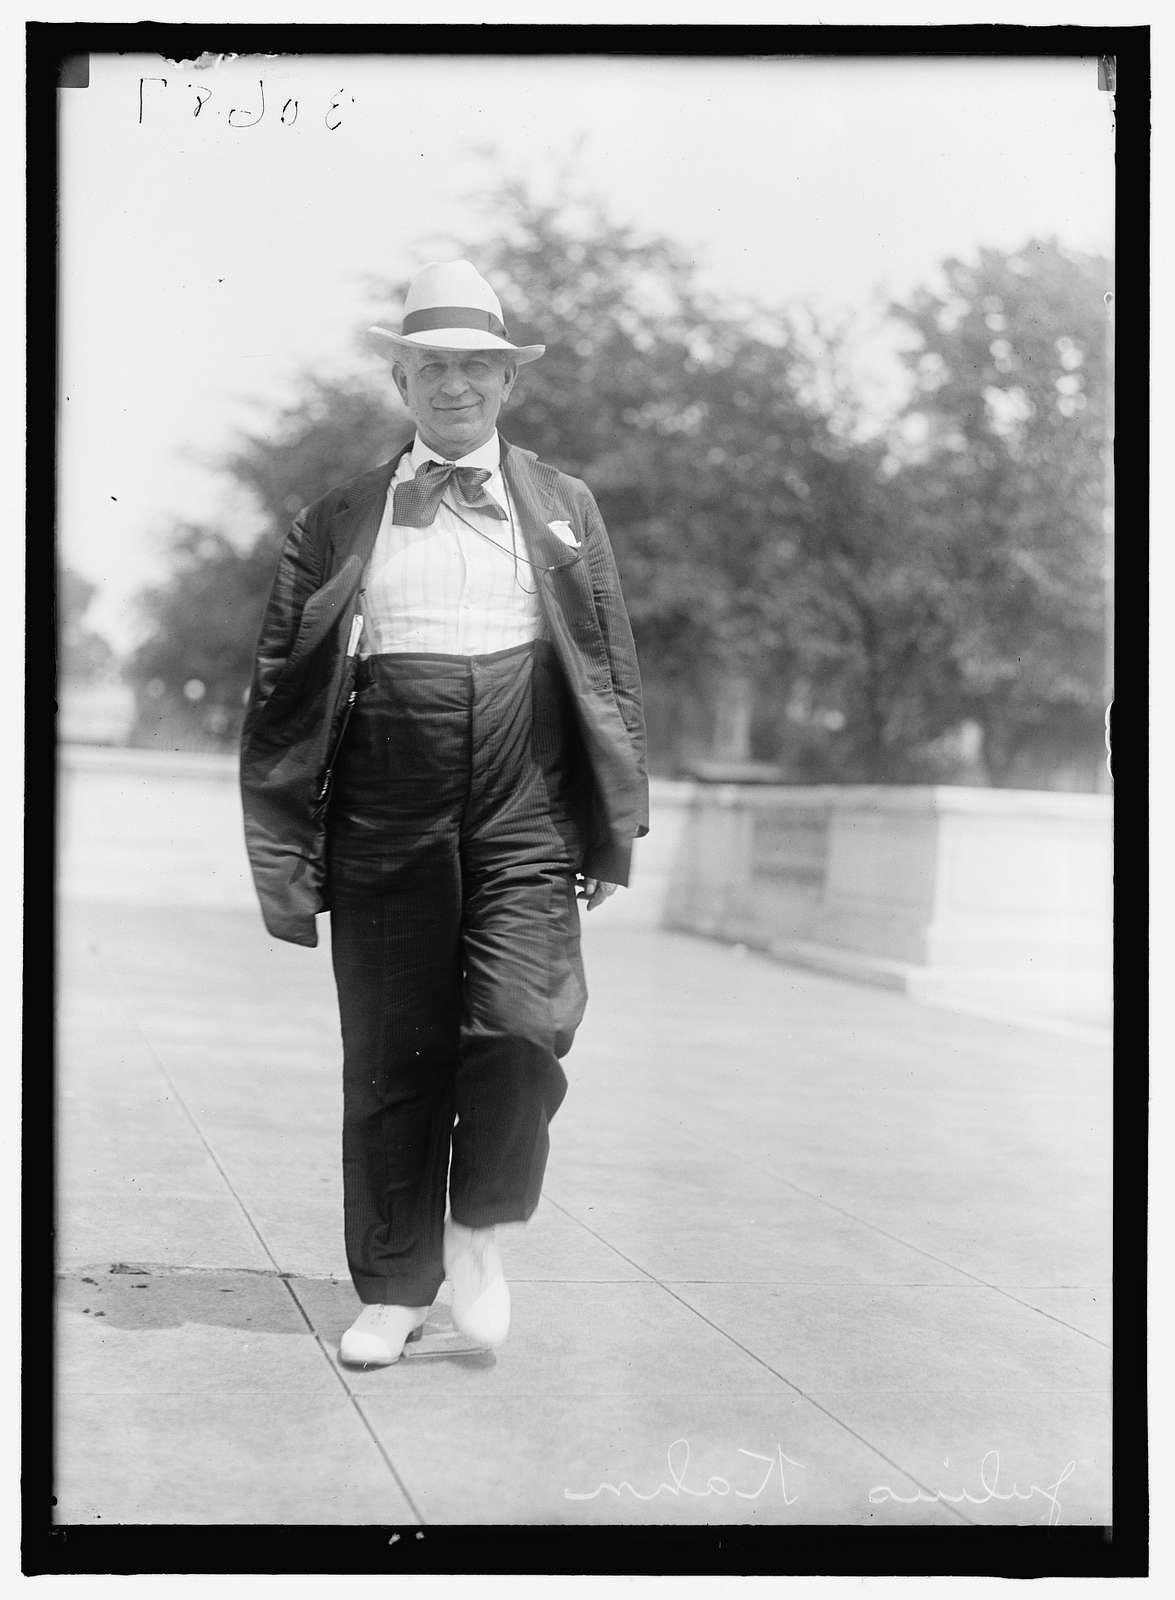 KAHN, JULIUS. REP. FROM CALIFORNIA, 1899-1903, 1905-1924